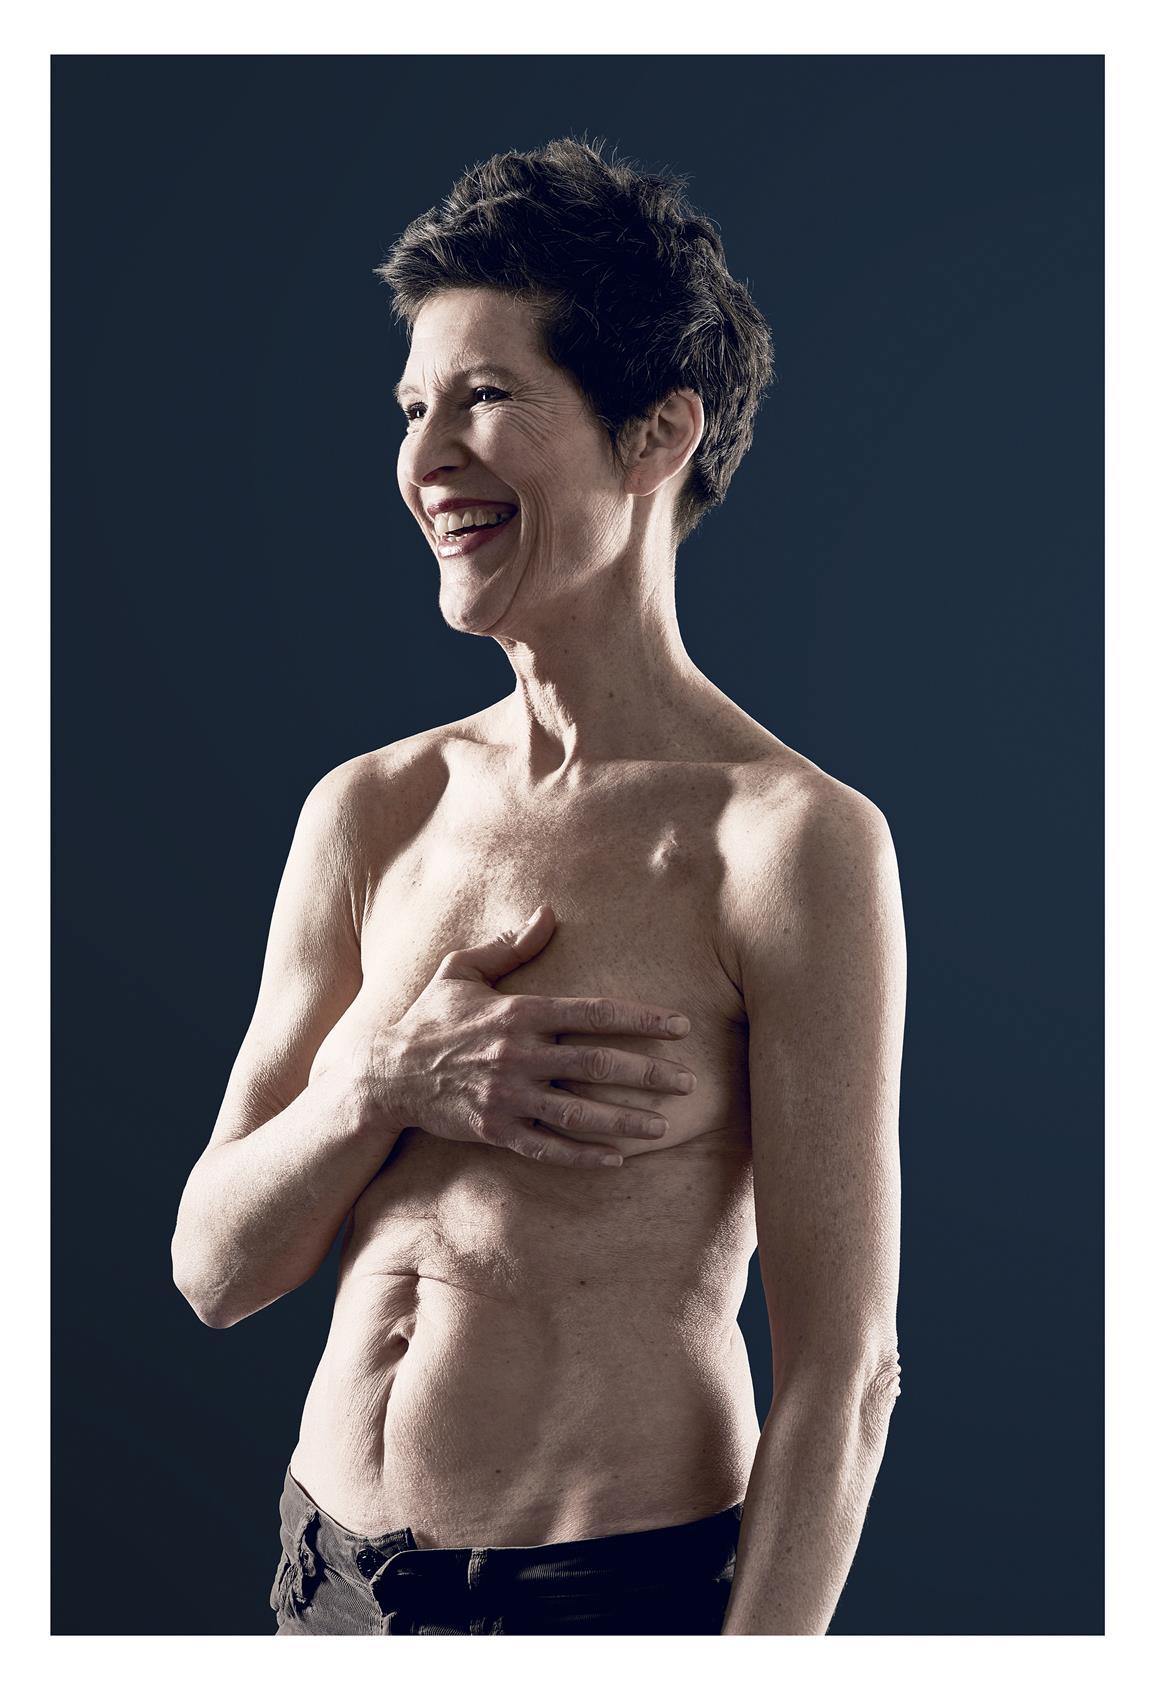 Femmes Fatales / Jurgen Rogiers / Photo Presse